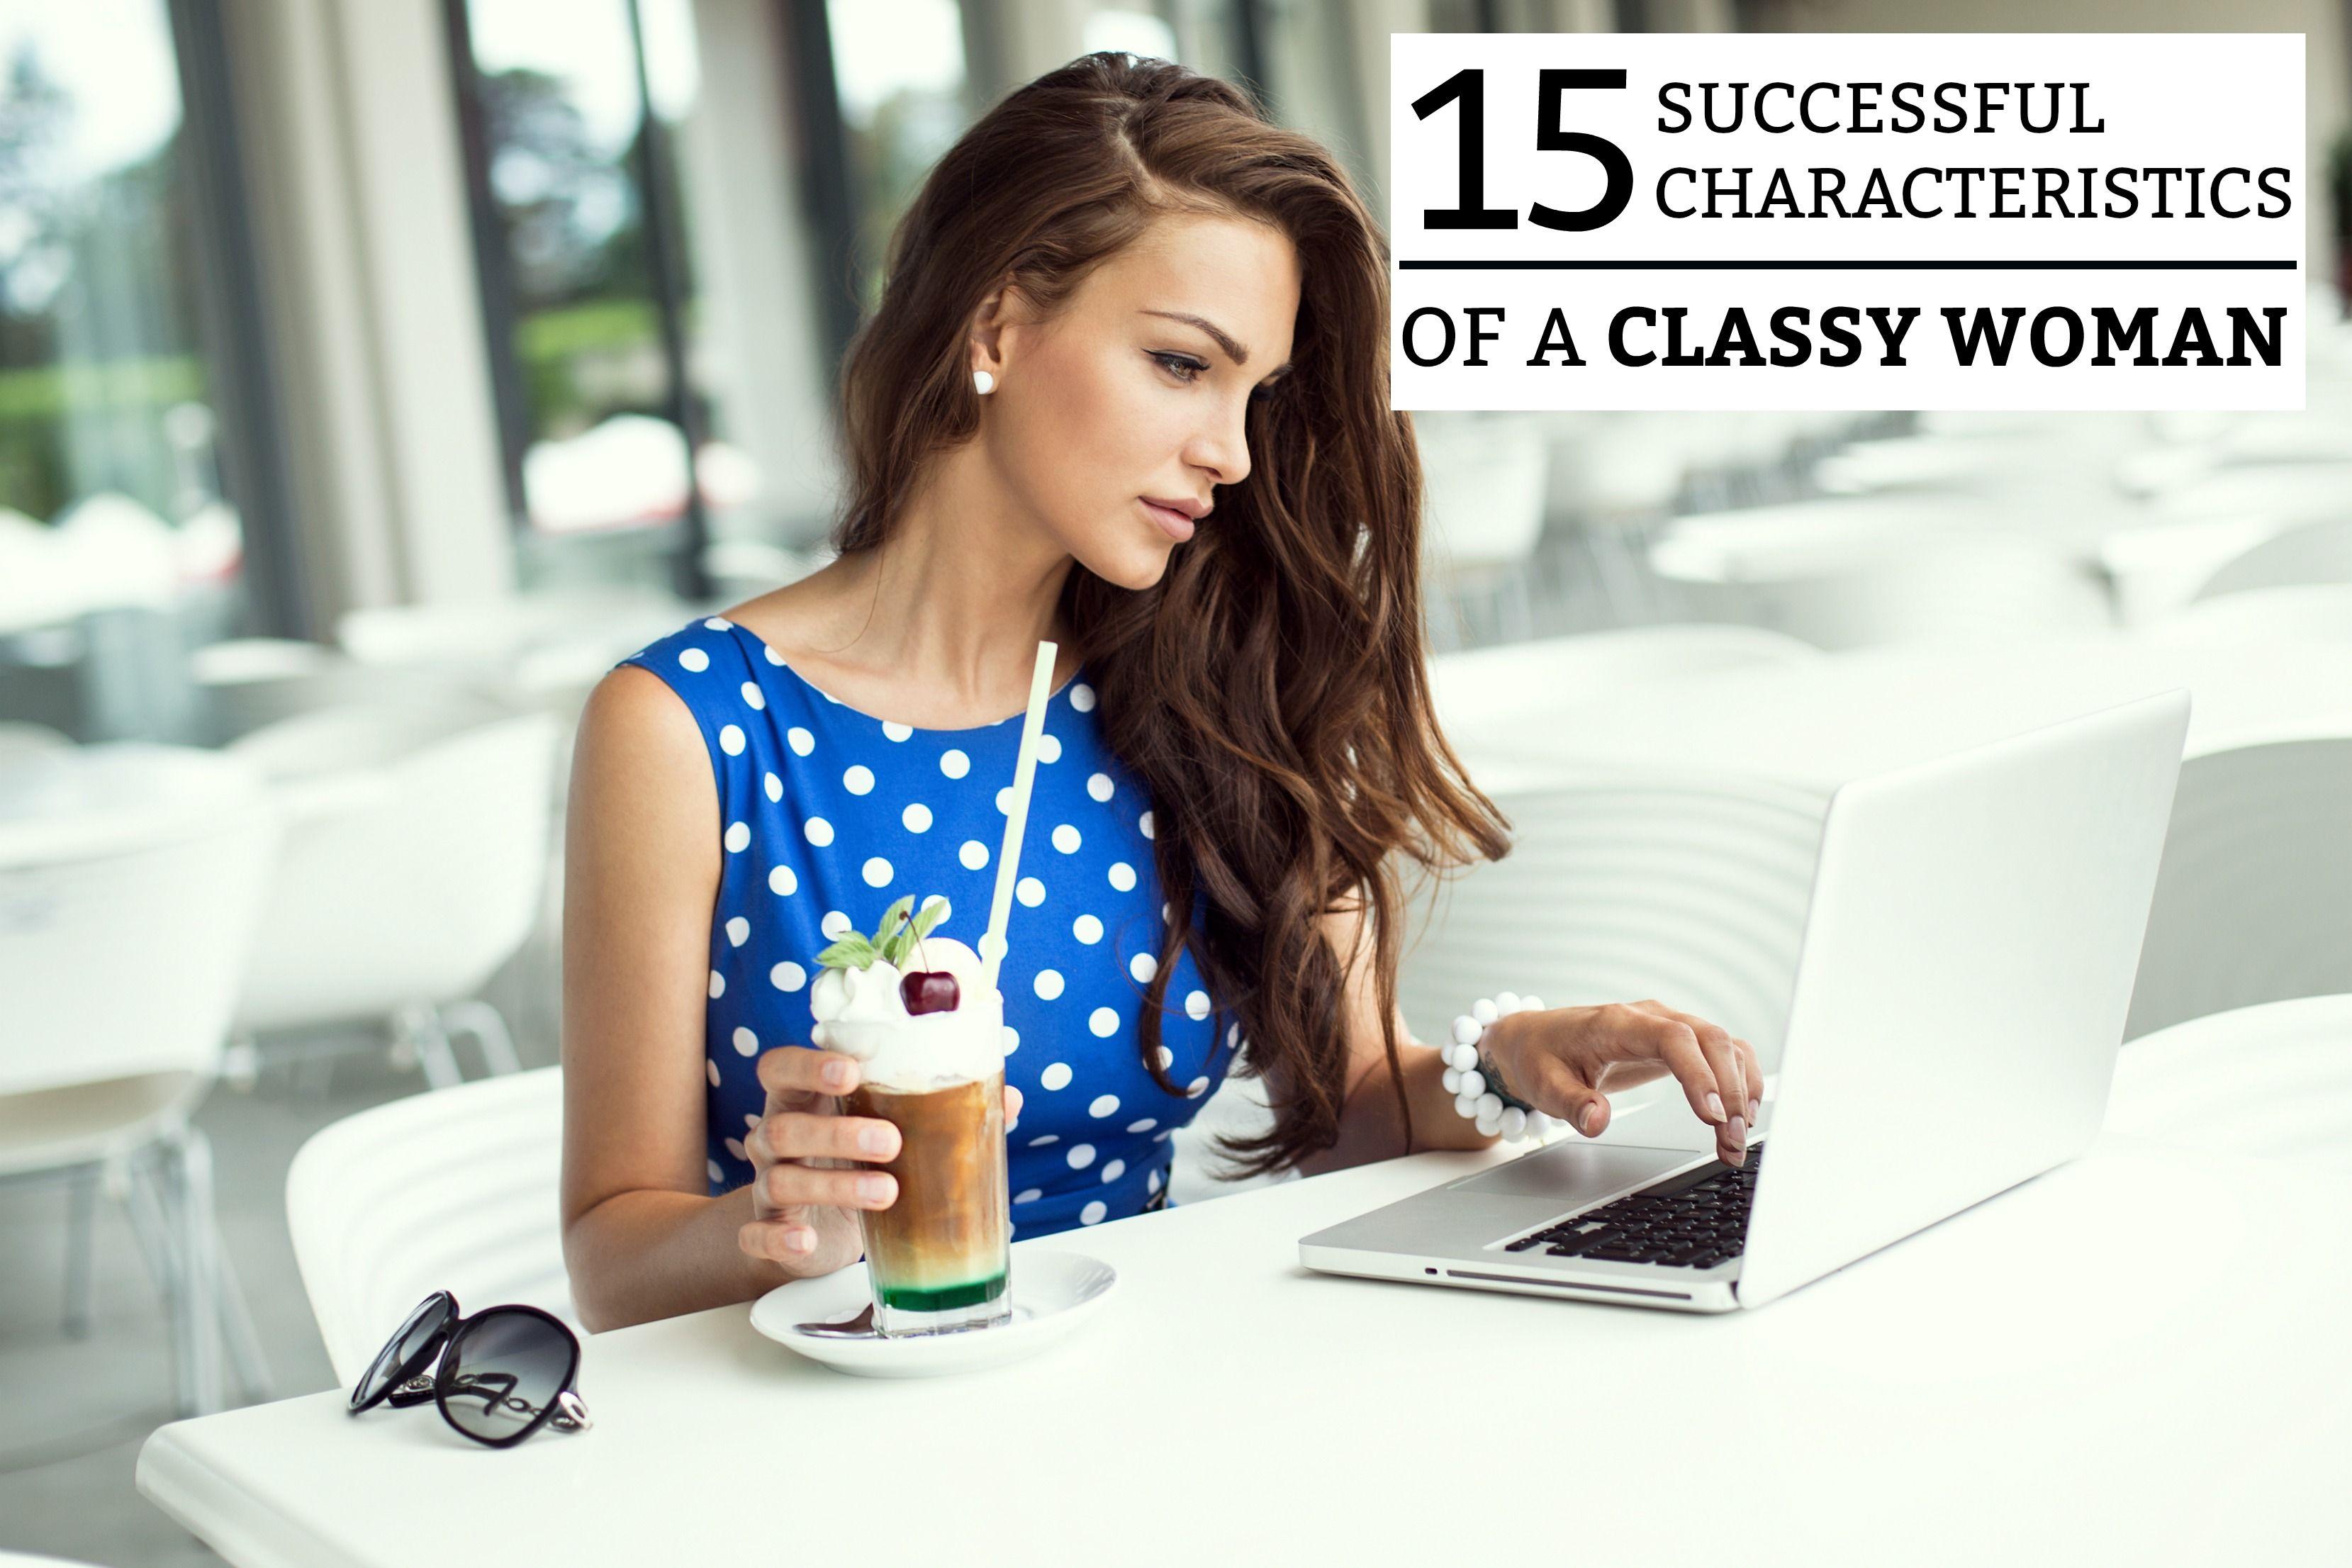 15 Successful Characteristics Of A Classy Woman Classy Women School Fashion Women